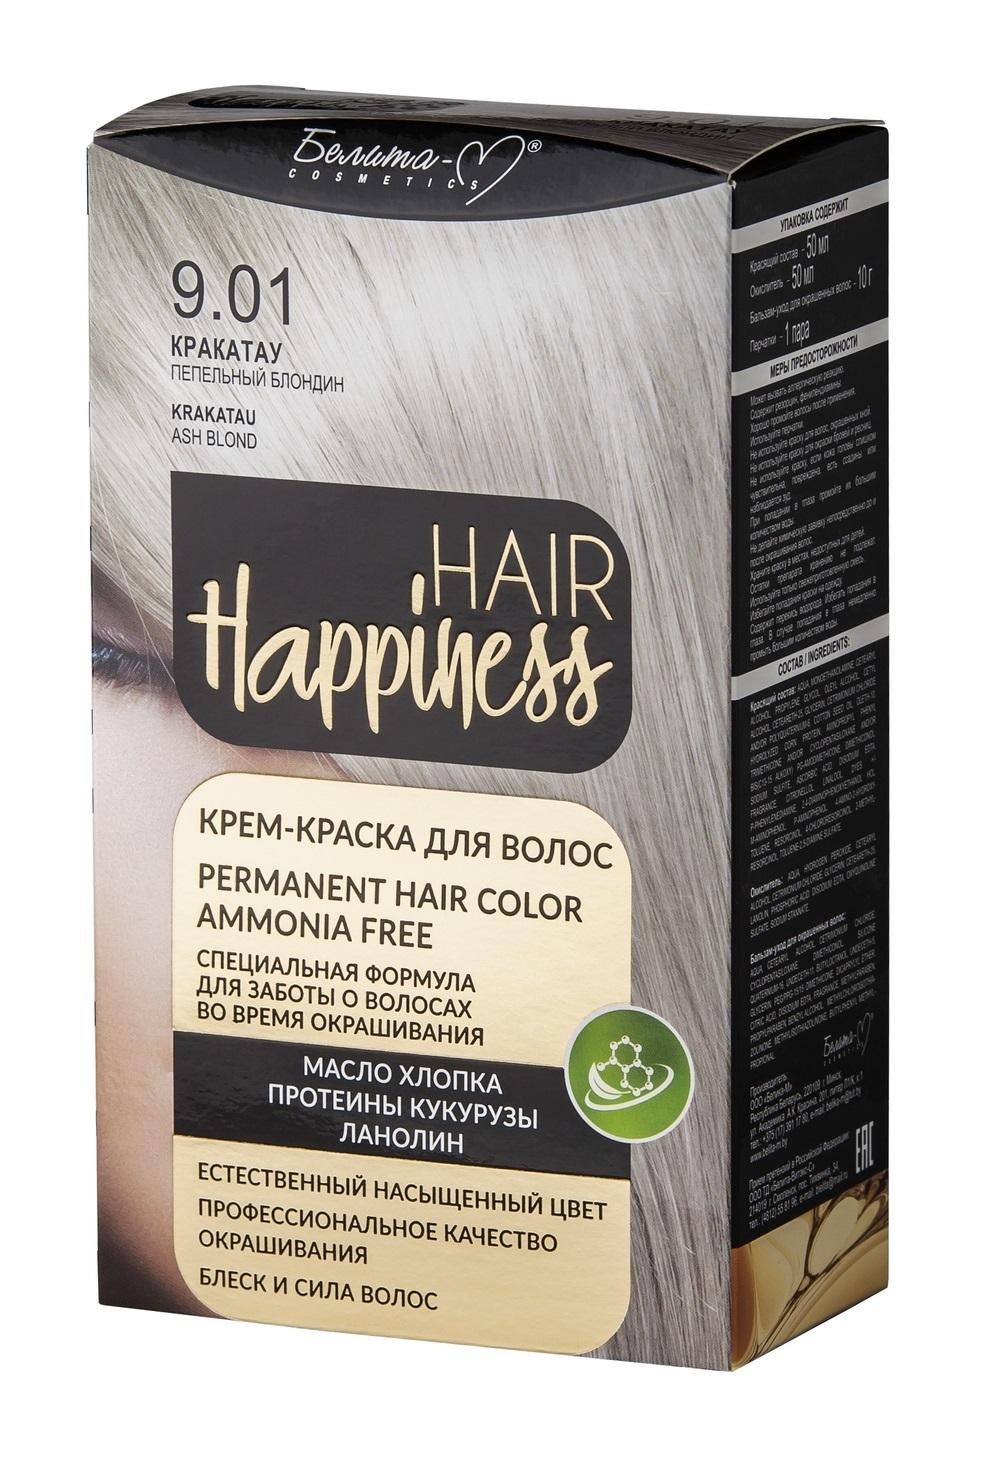 HAIR HAPPINESS для блондинок